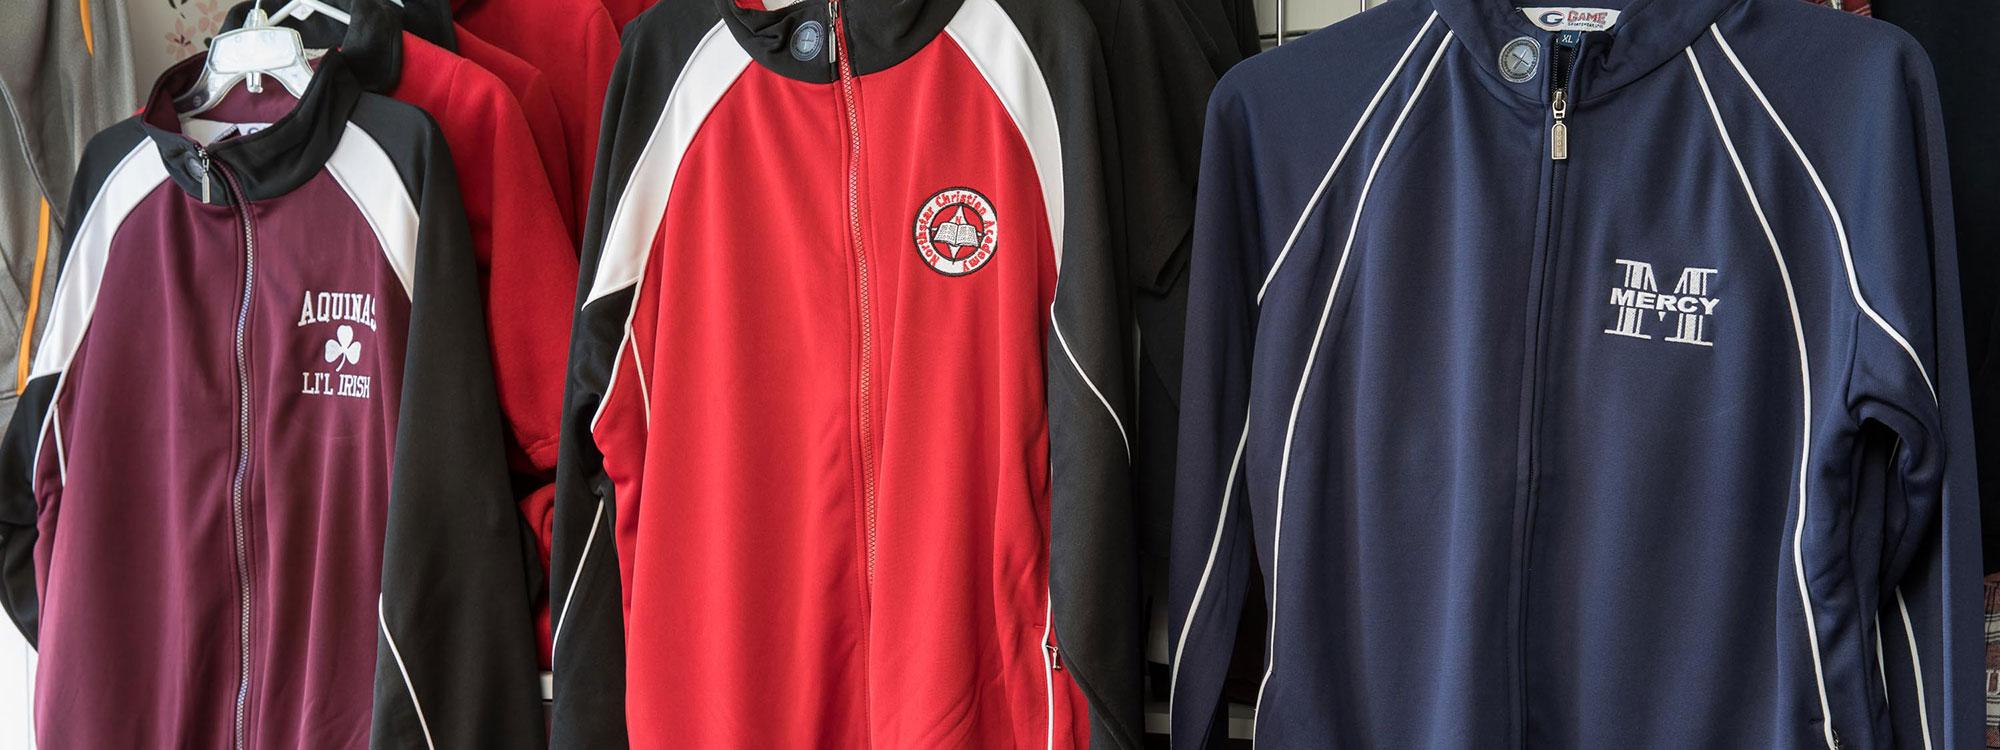 Stitchworks - school uniforms - embroidery - Rochester